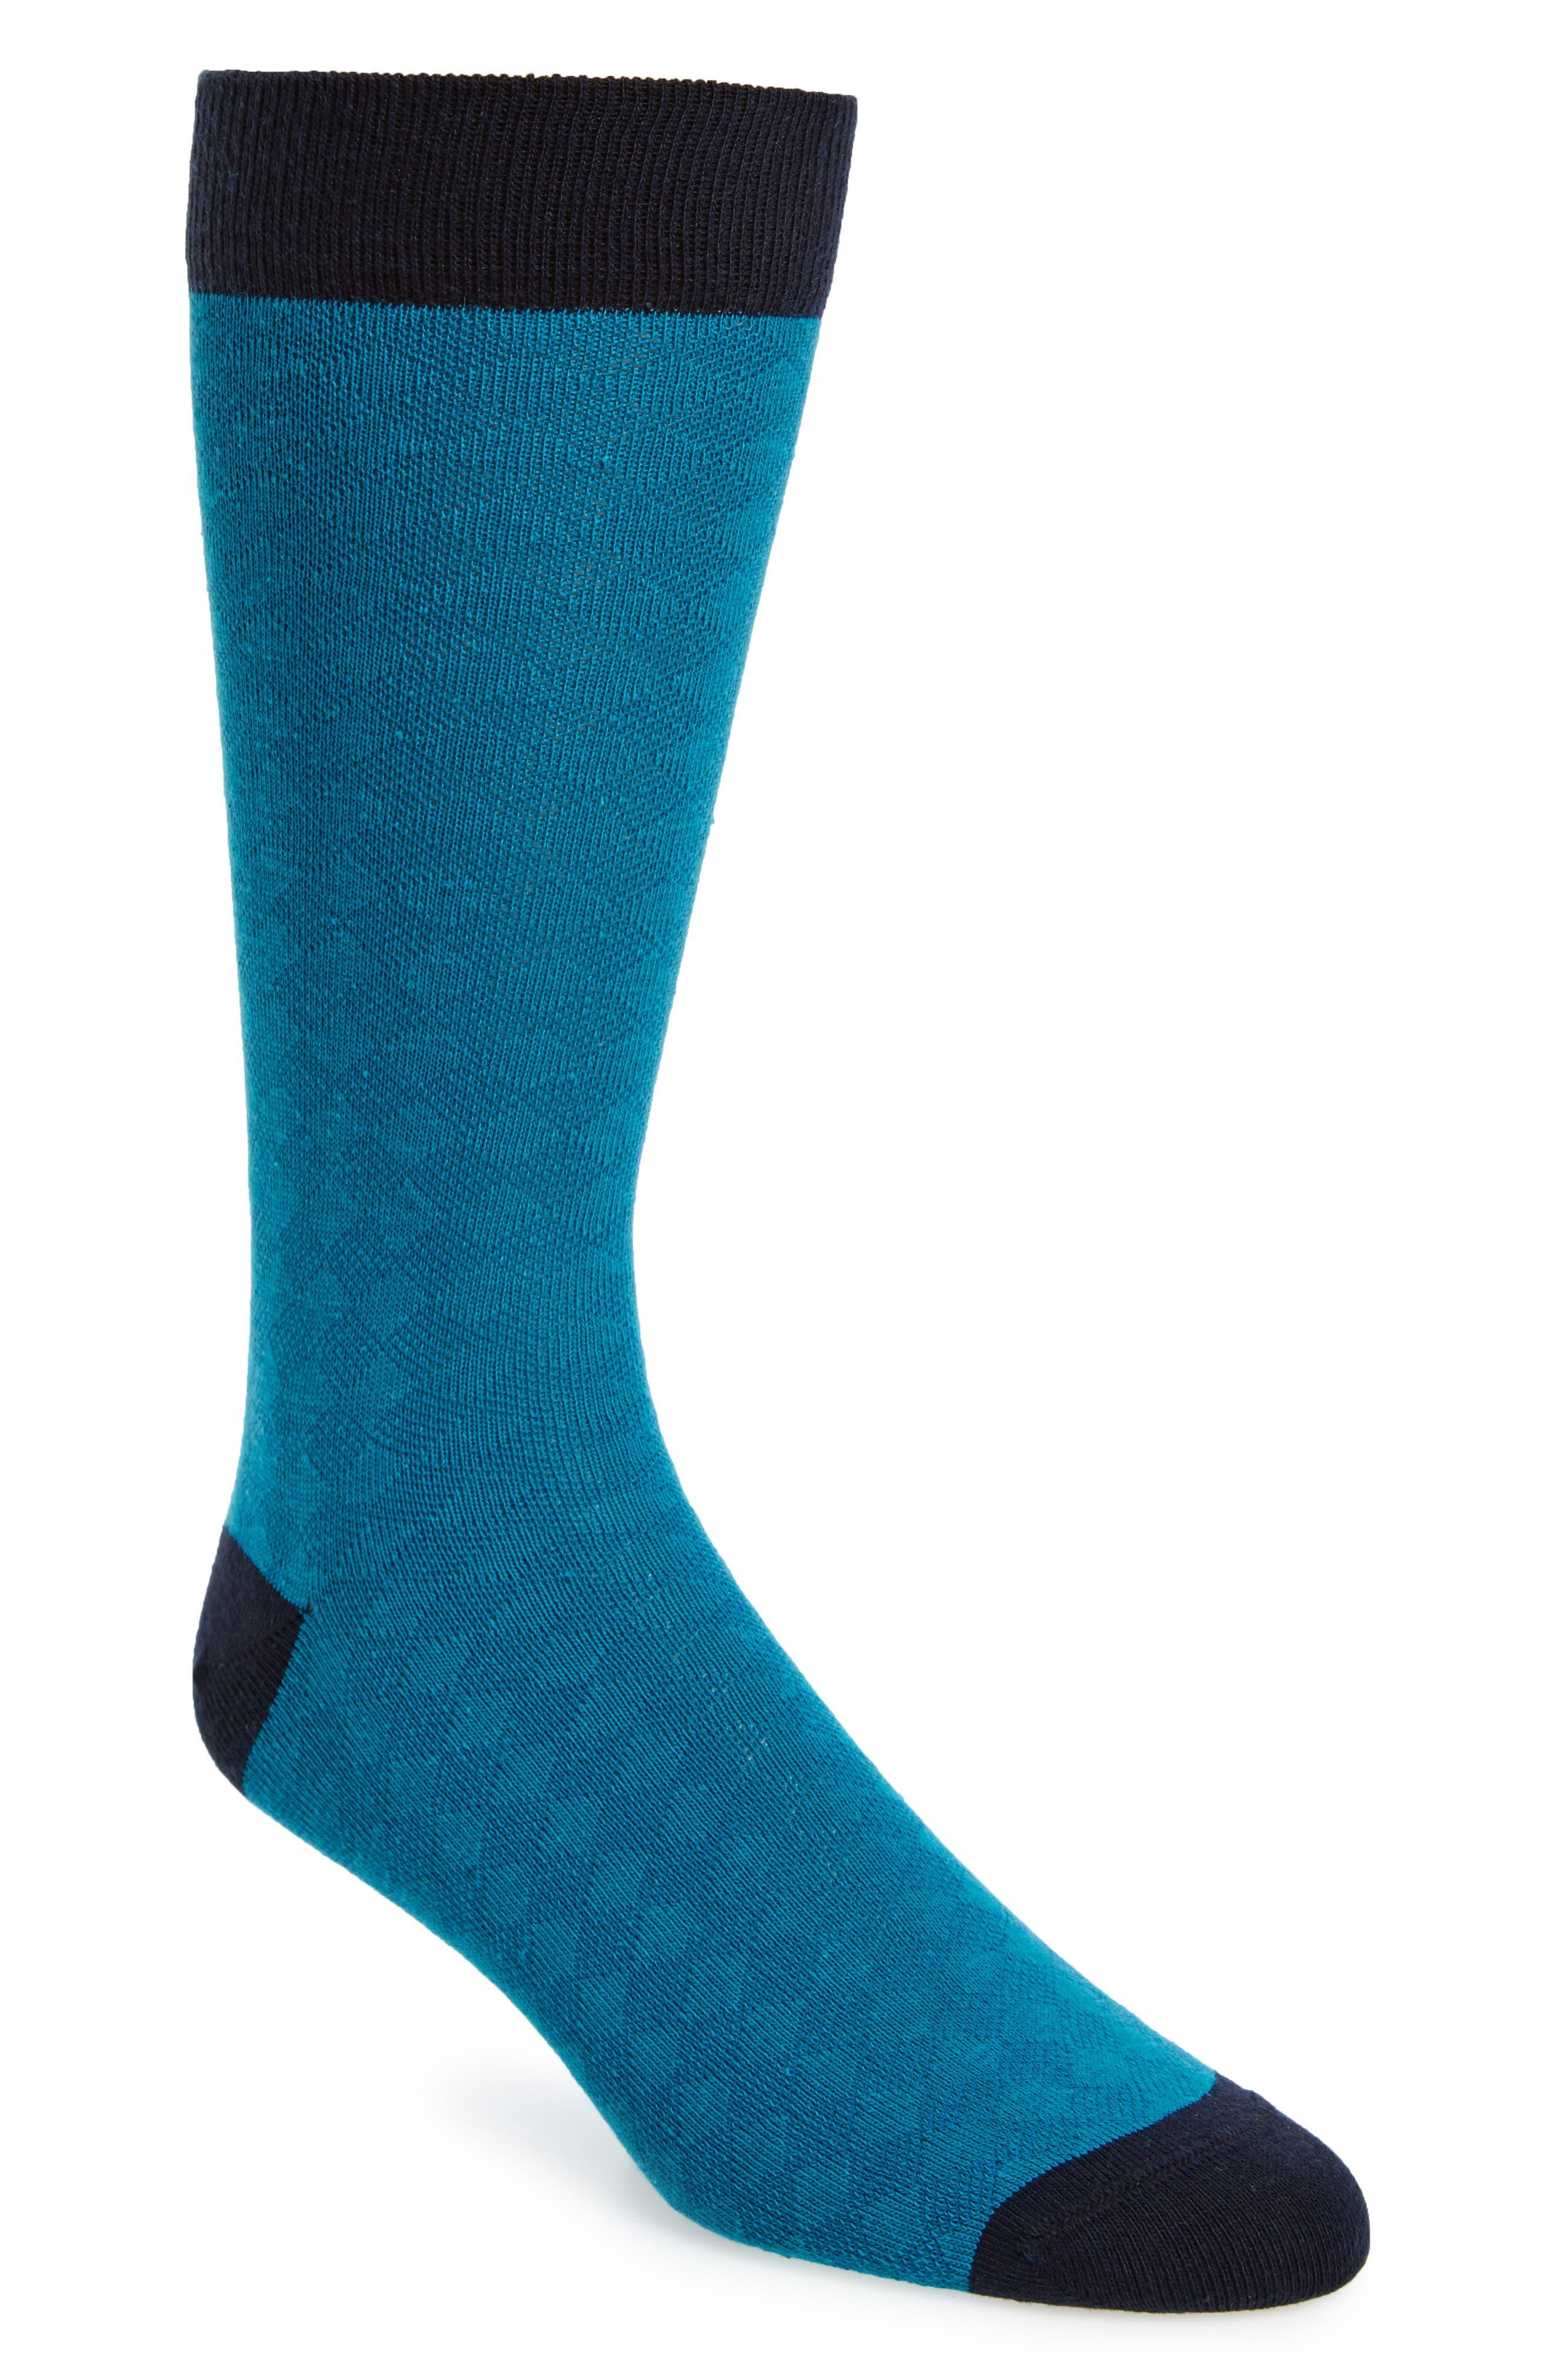 Oakwood Geometric Socks,                         Main,                         color, Teal